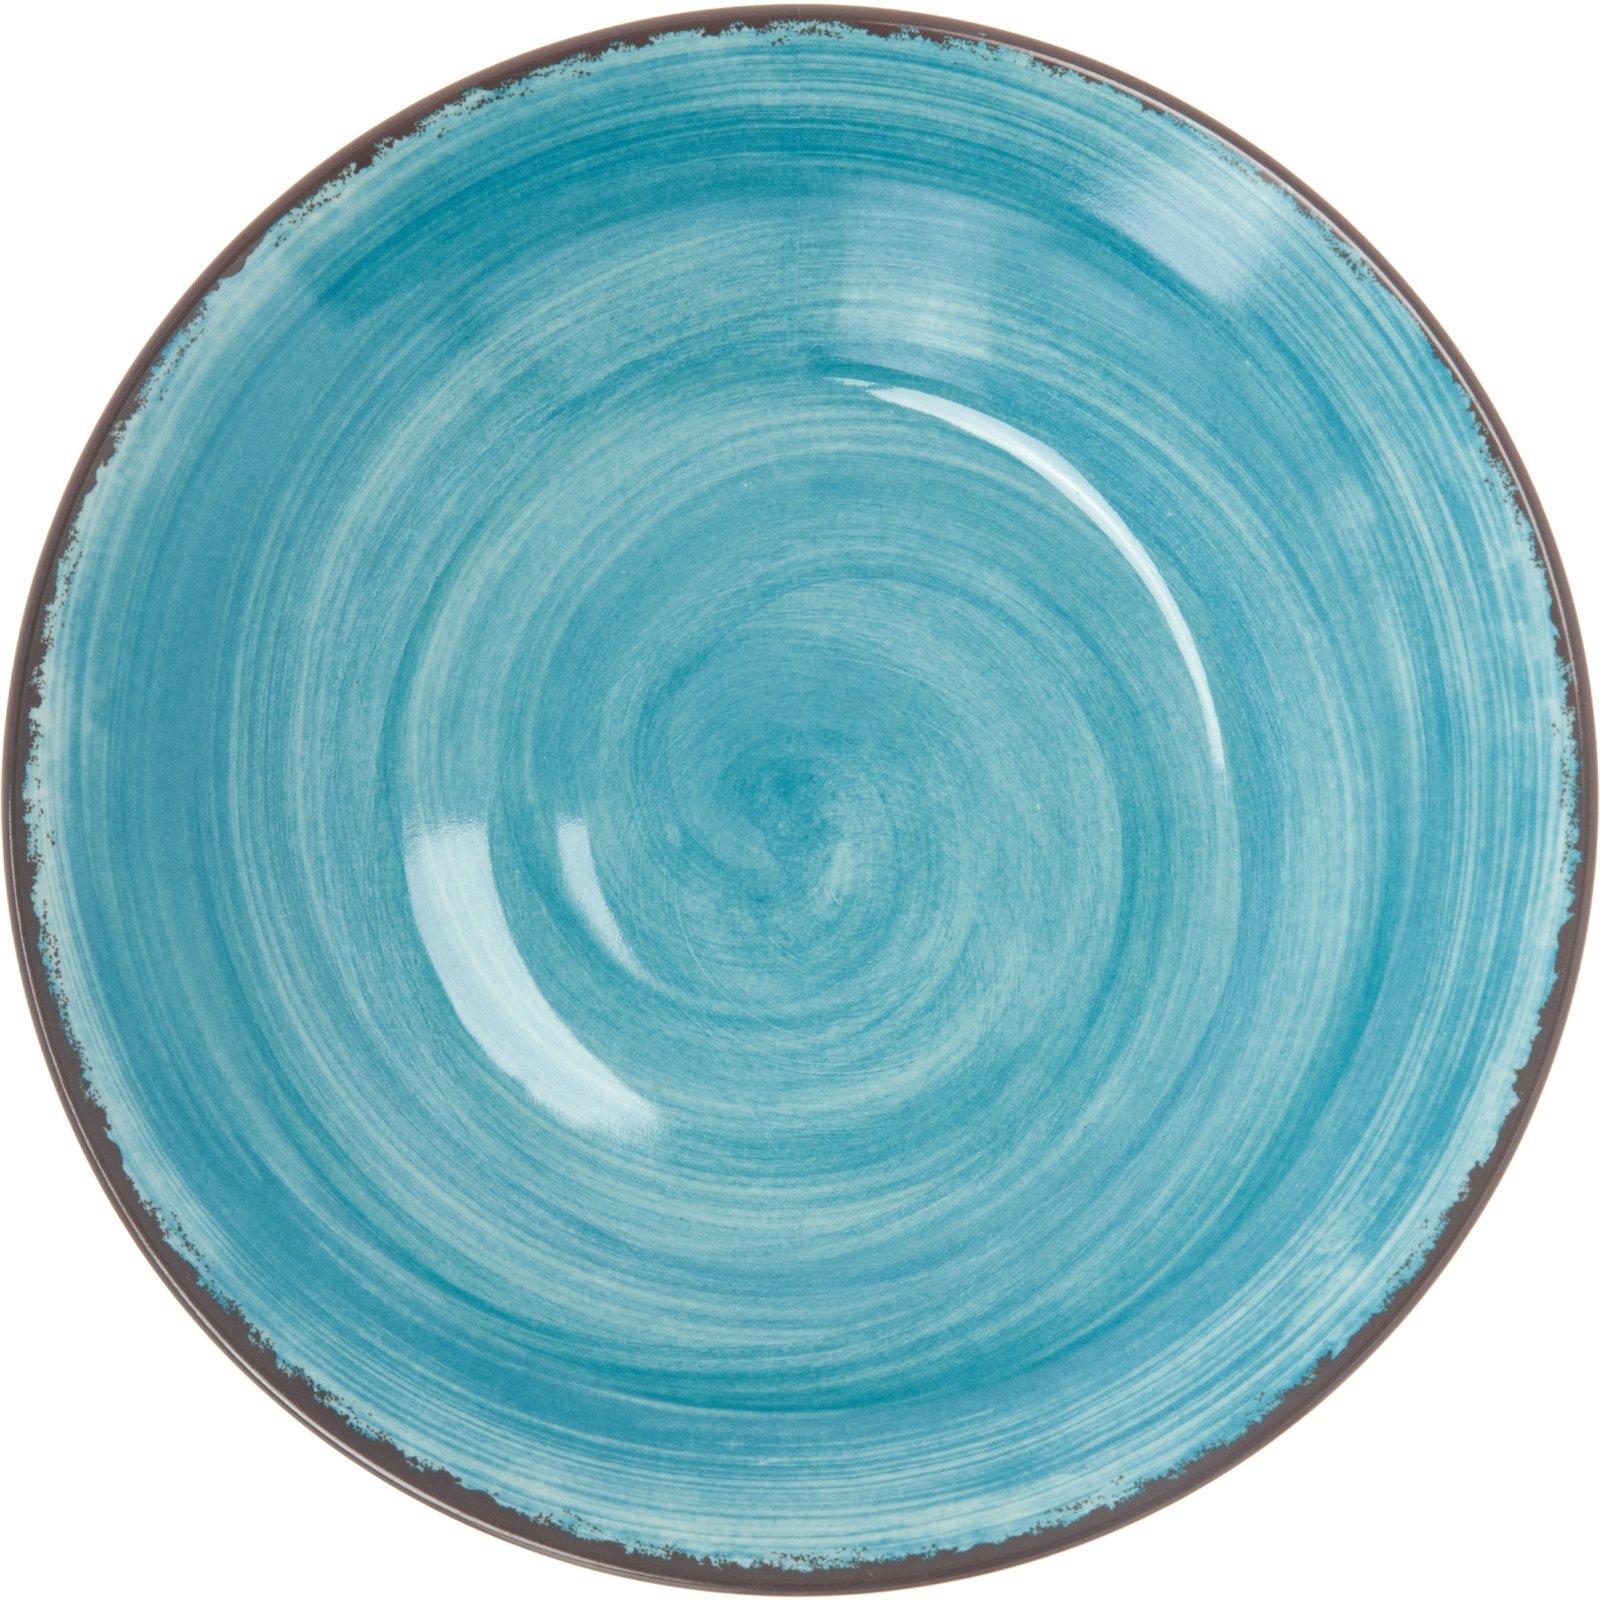 ... 5400315 - Mingle Melamine Rimmed Soup Bowl 28.5 oz - Aqua  sc 1 st  Carlisle FoodService Products & 5400315 - Mingle Melamine Rimmed Soup Bowl 28.5 oz - Aqua | Carlisle ...